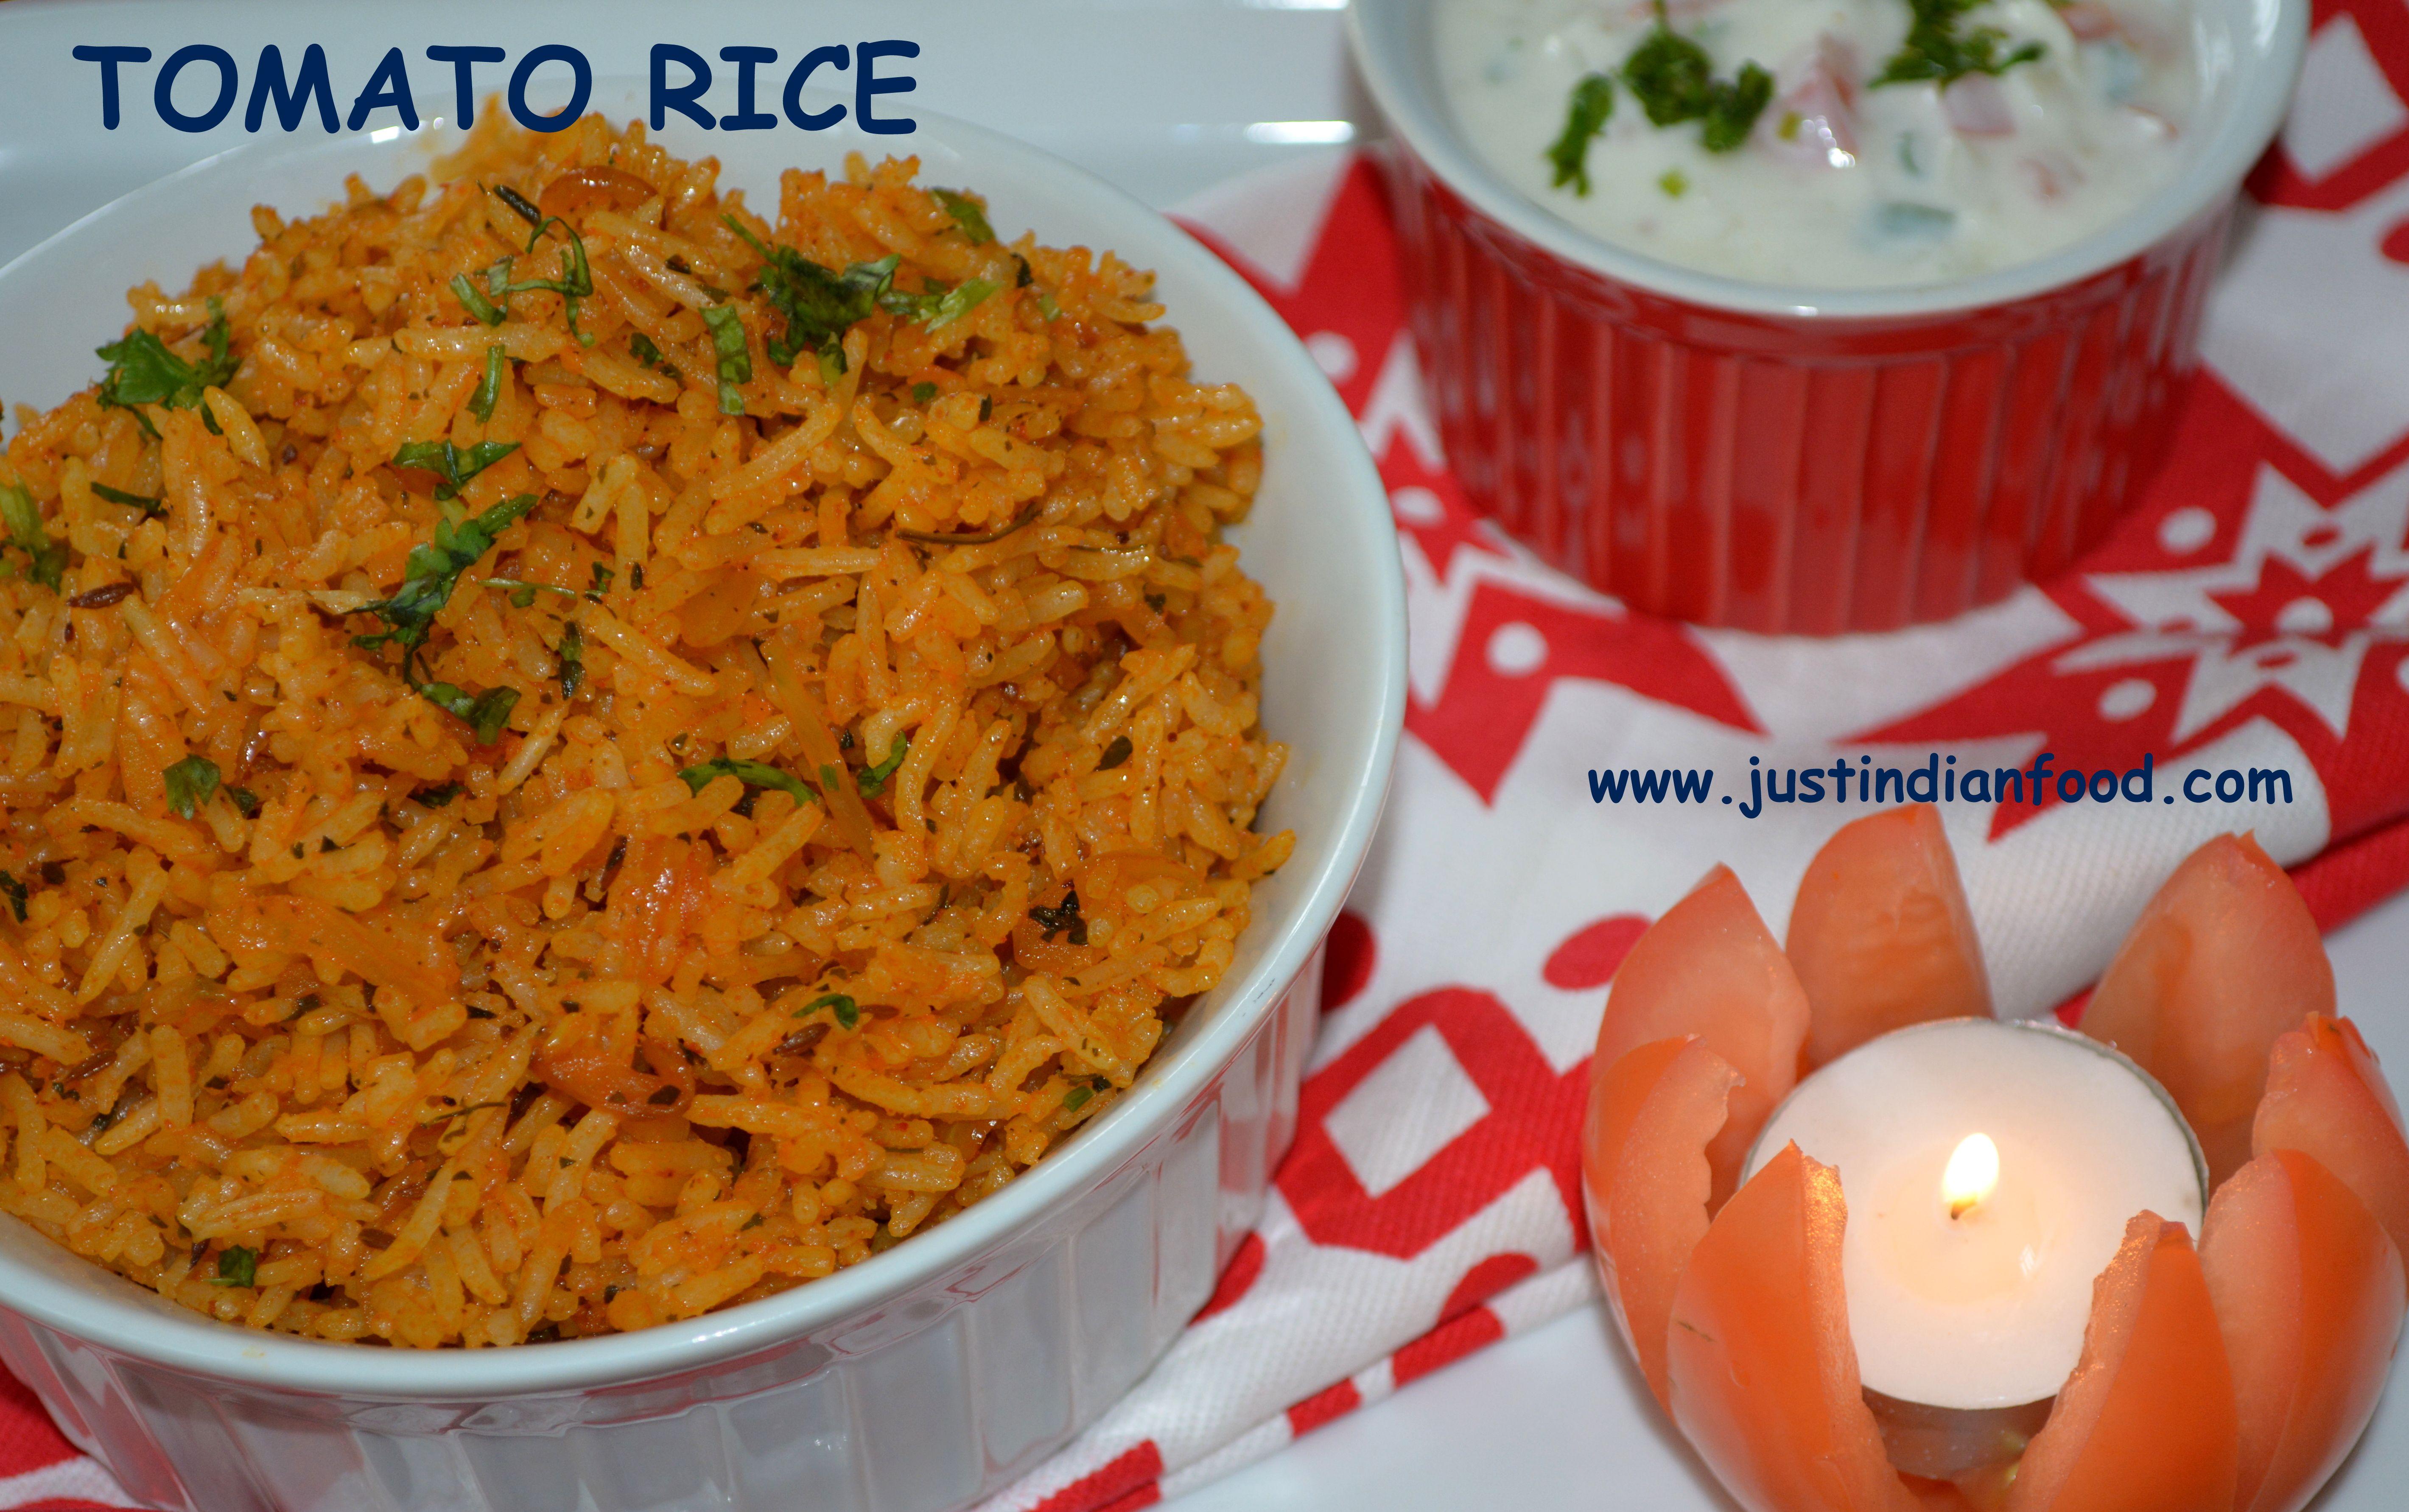 Tomato rice organic grills and baking pinterest tomato rice food tomato rice tomato ricegrillsindian recipesorganicindian forumfinder Gallery